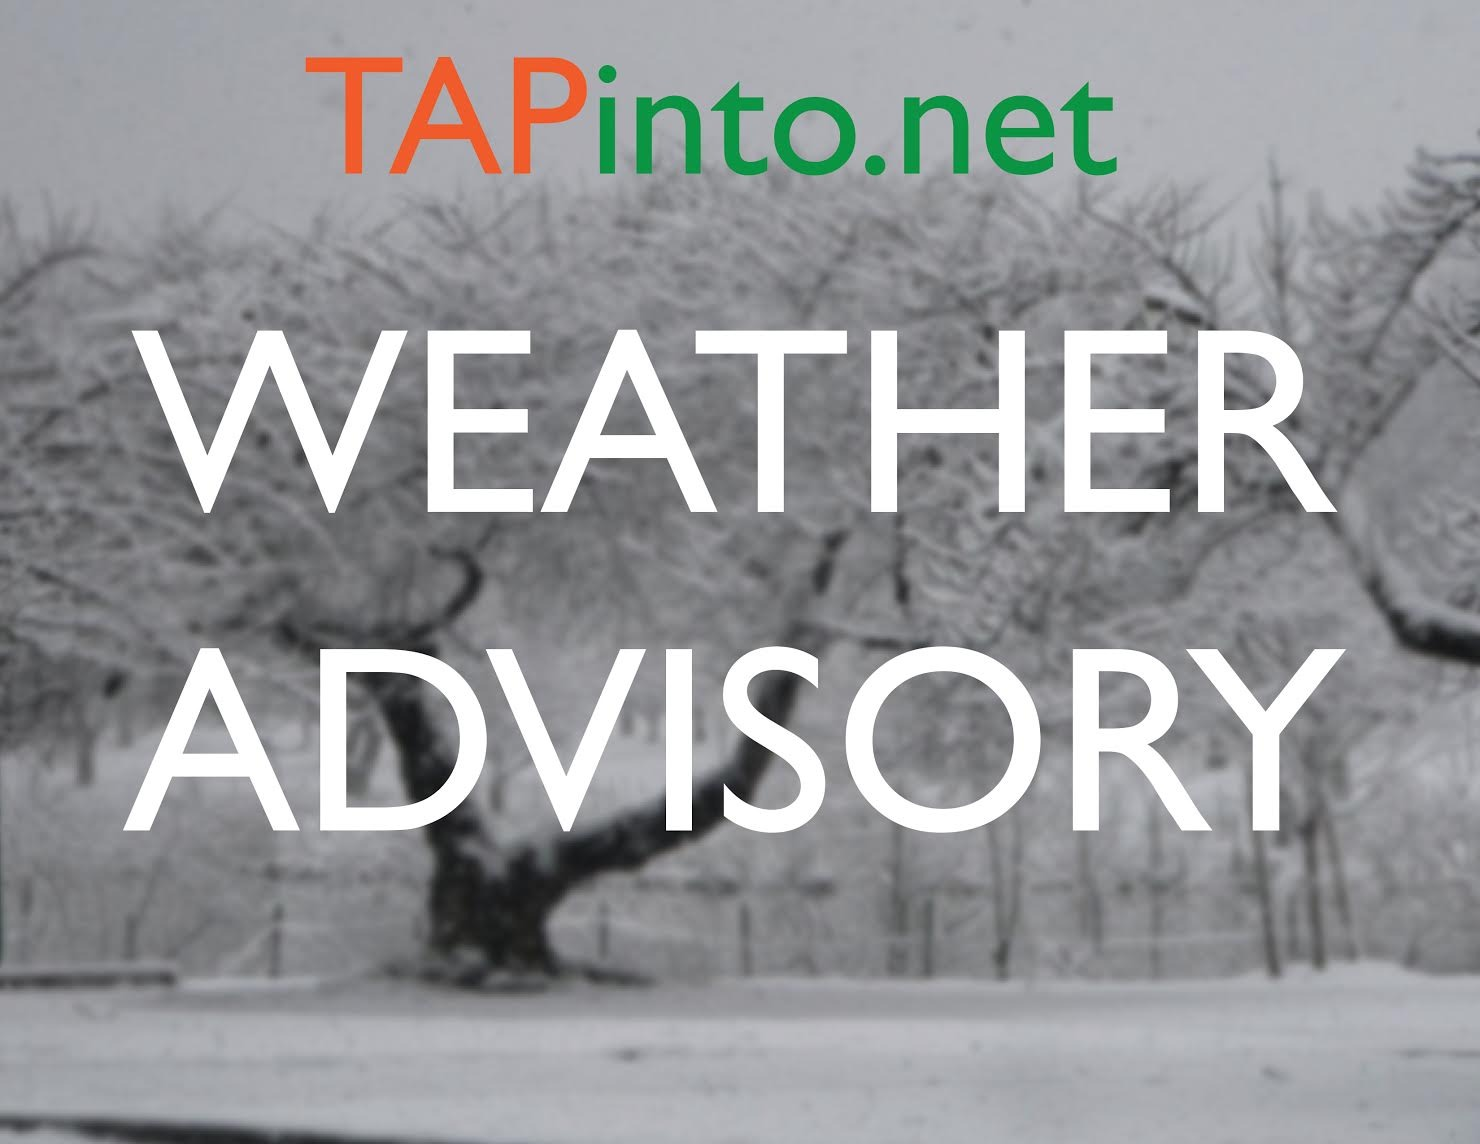 c4164f18395dd779bbe0_weather_advisory.jpg